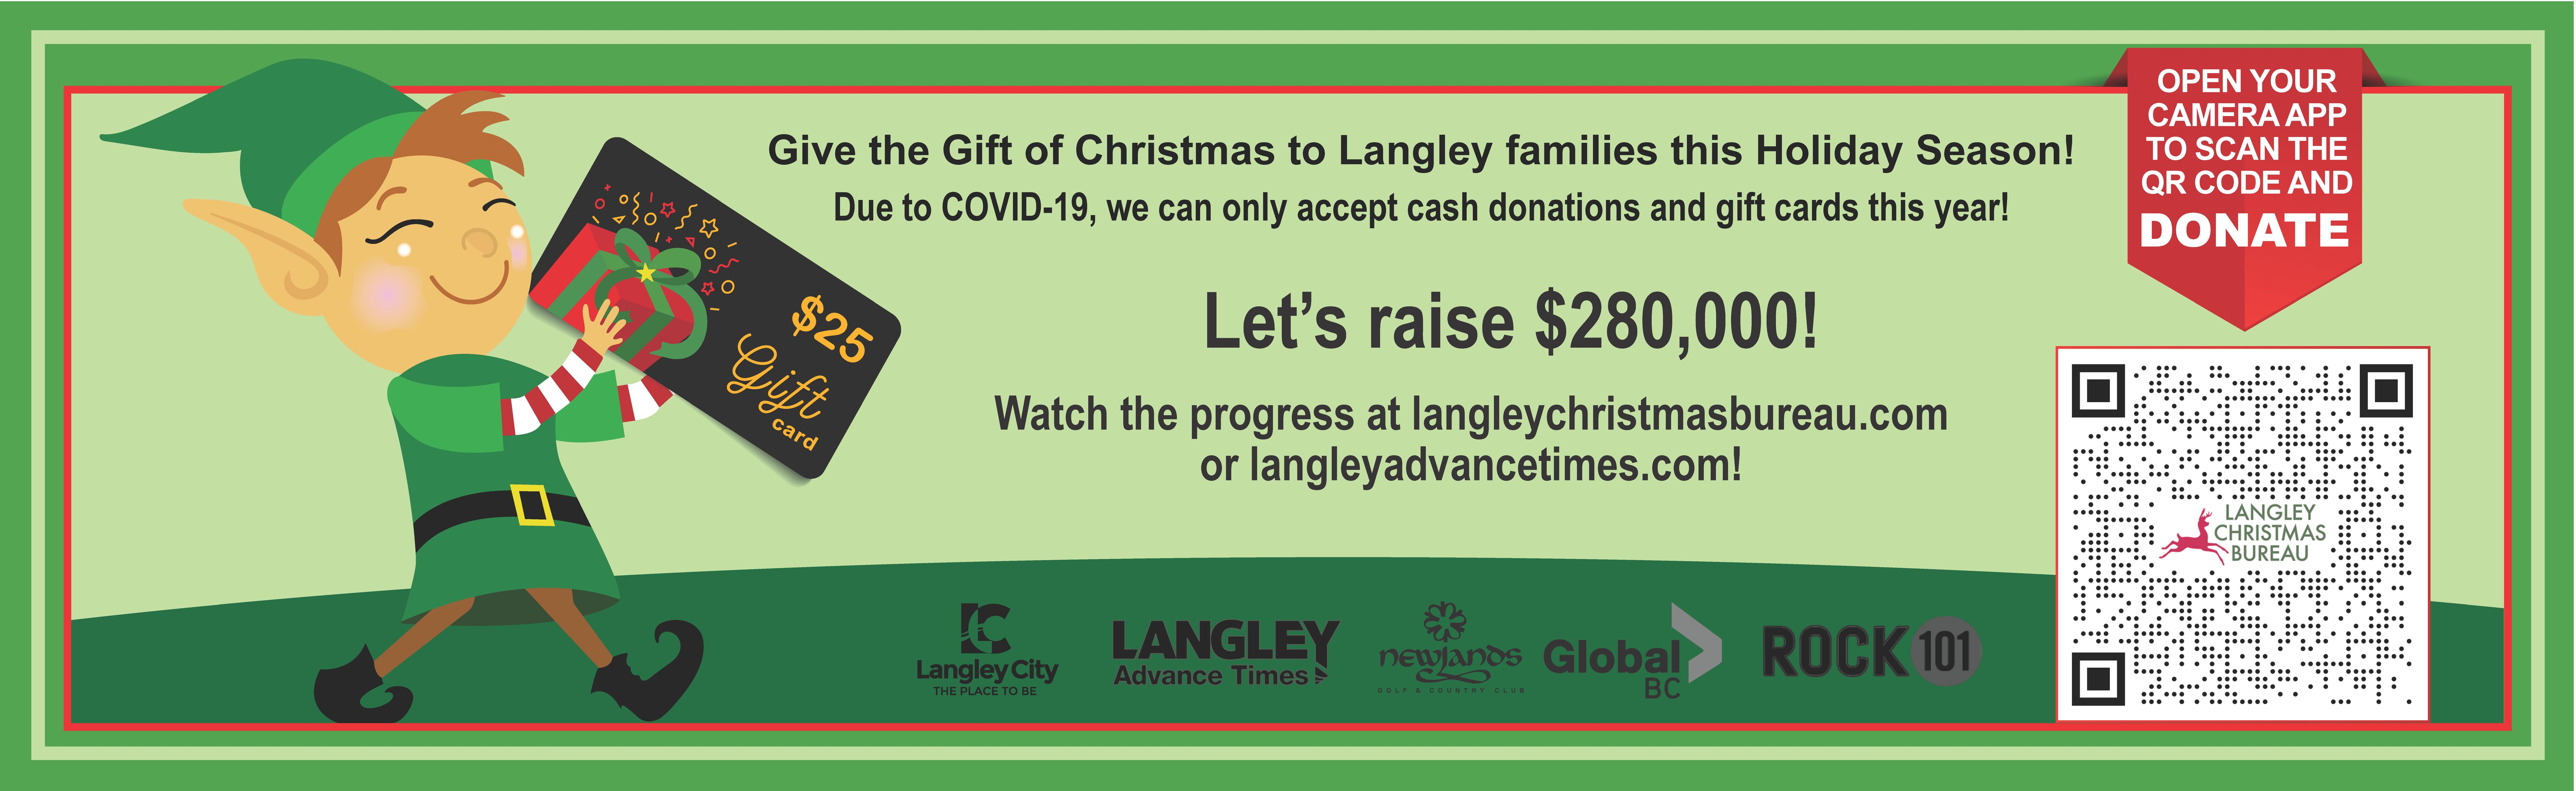 Langley Christmas Bureau Donation Fund